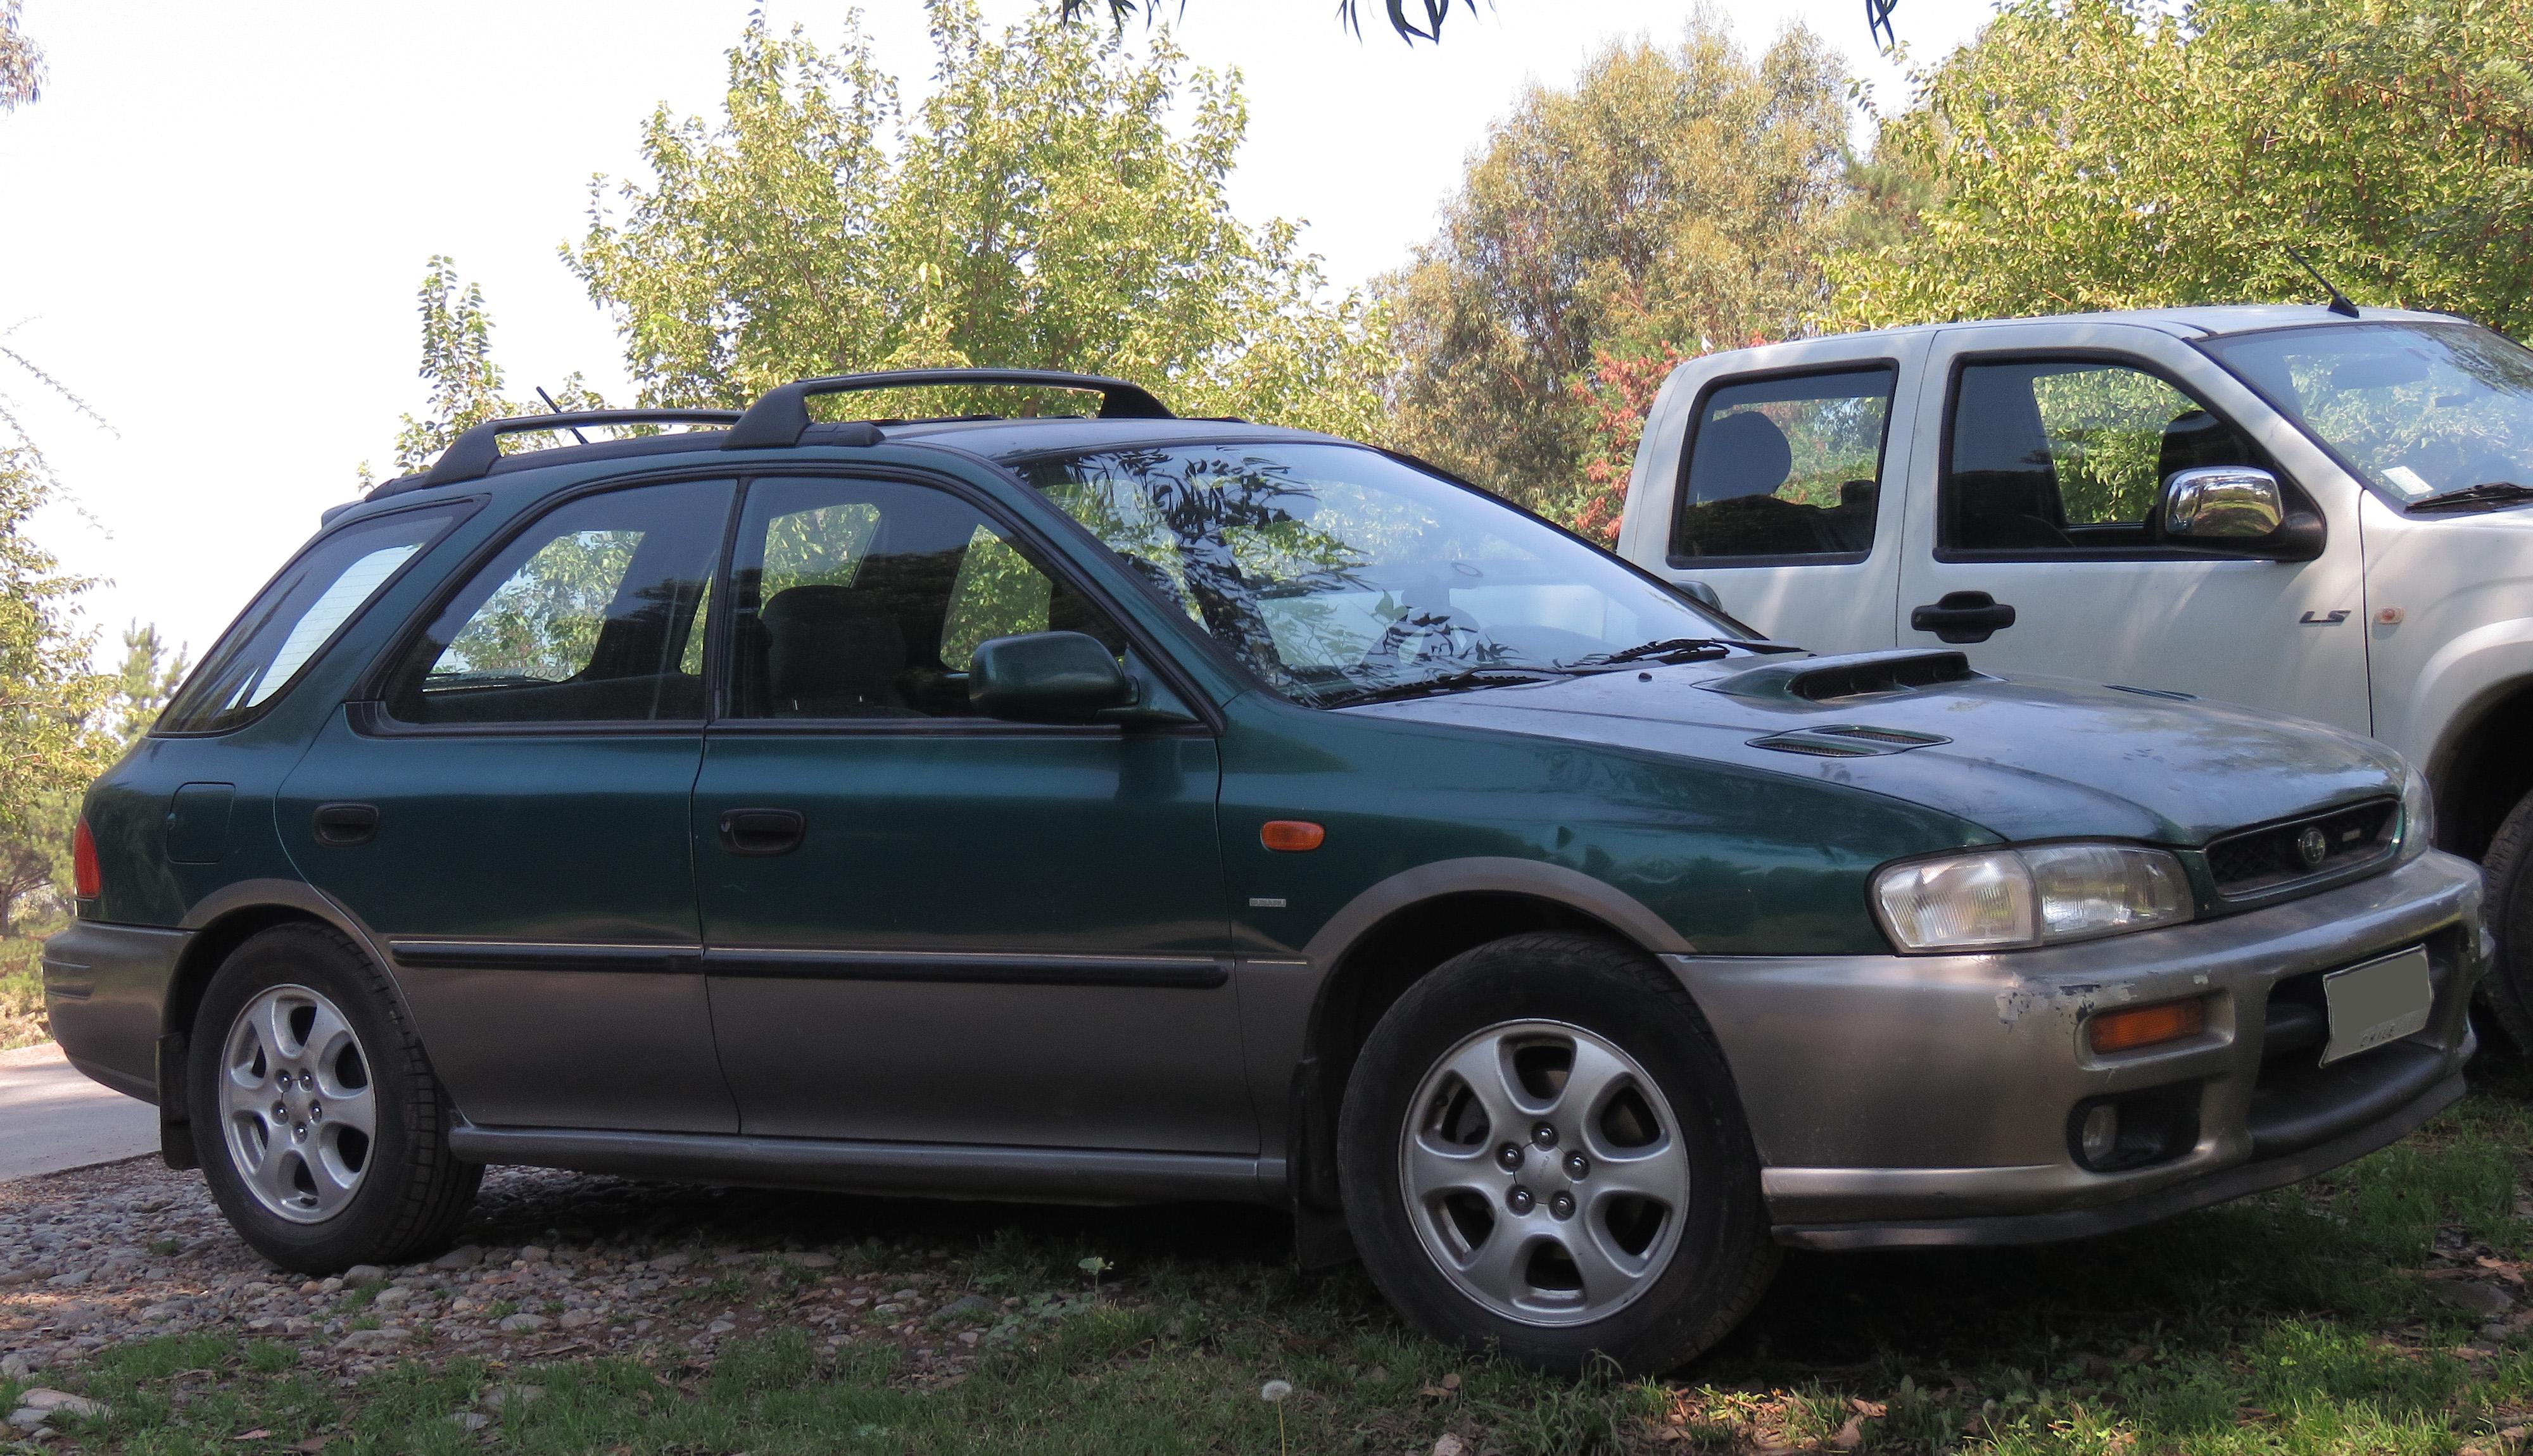 file subaru impreza 2 2 sport wagon awd 1999 36138959335 jpg wikimedia commons https commons wikimedia org wiki file subaru impreza 2 2 sport wagon awd 1999 36138959335 jpg